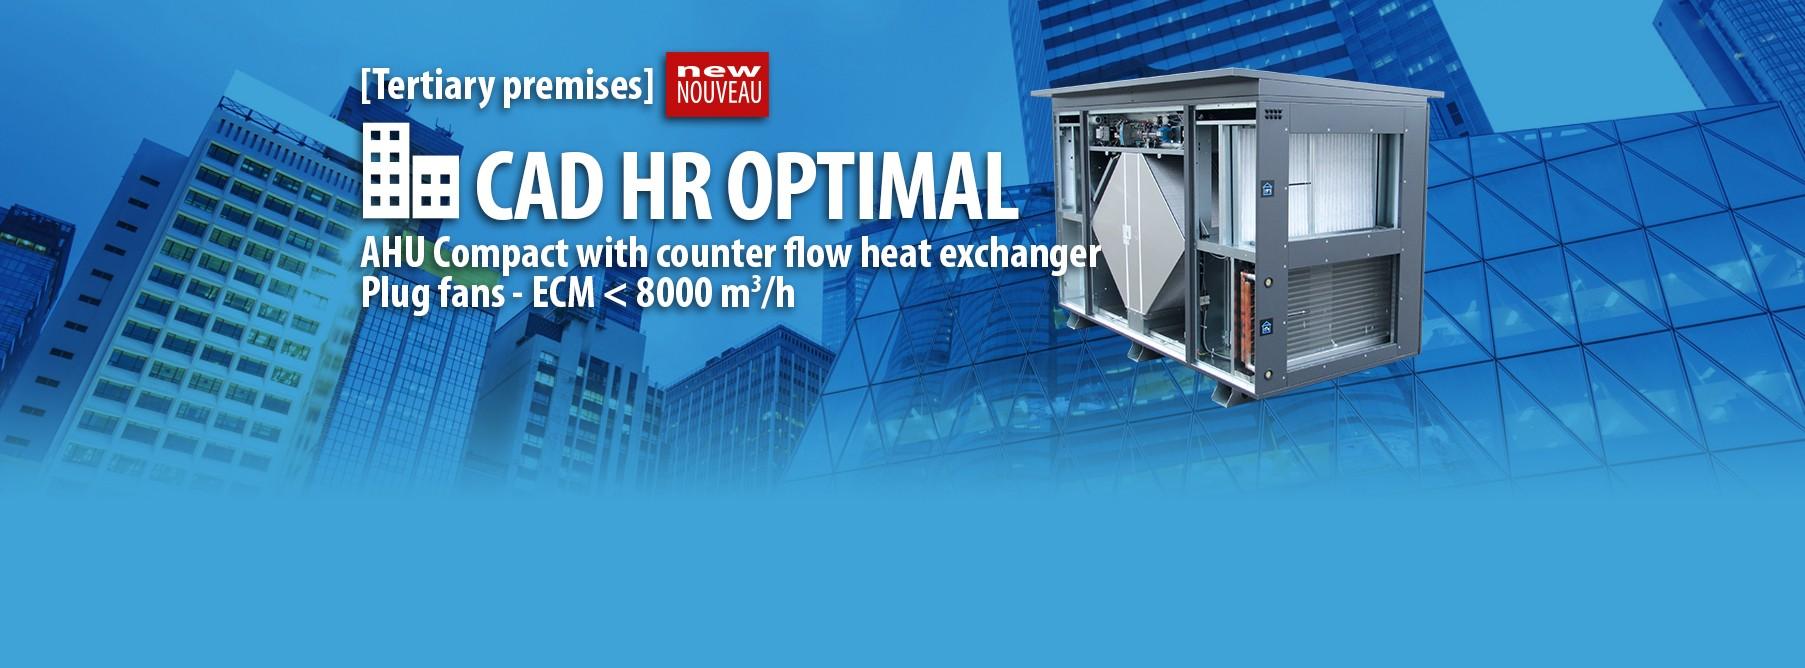 AHU Compact with counter flow heat exchanger Plug fans - ECM < 8000 m3/h